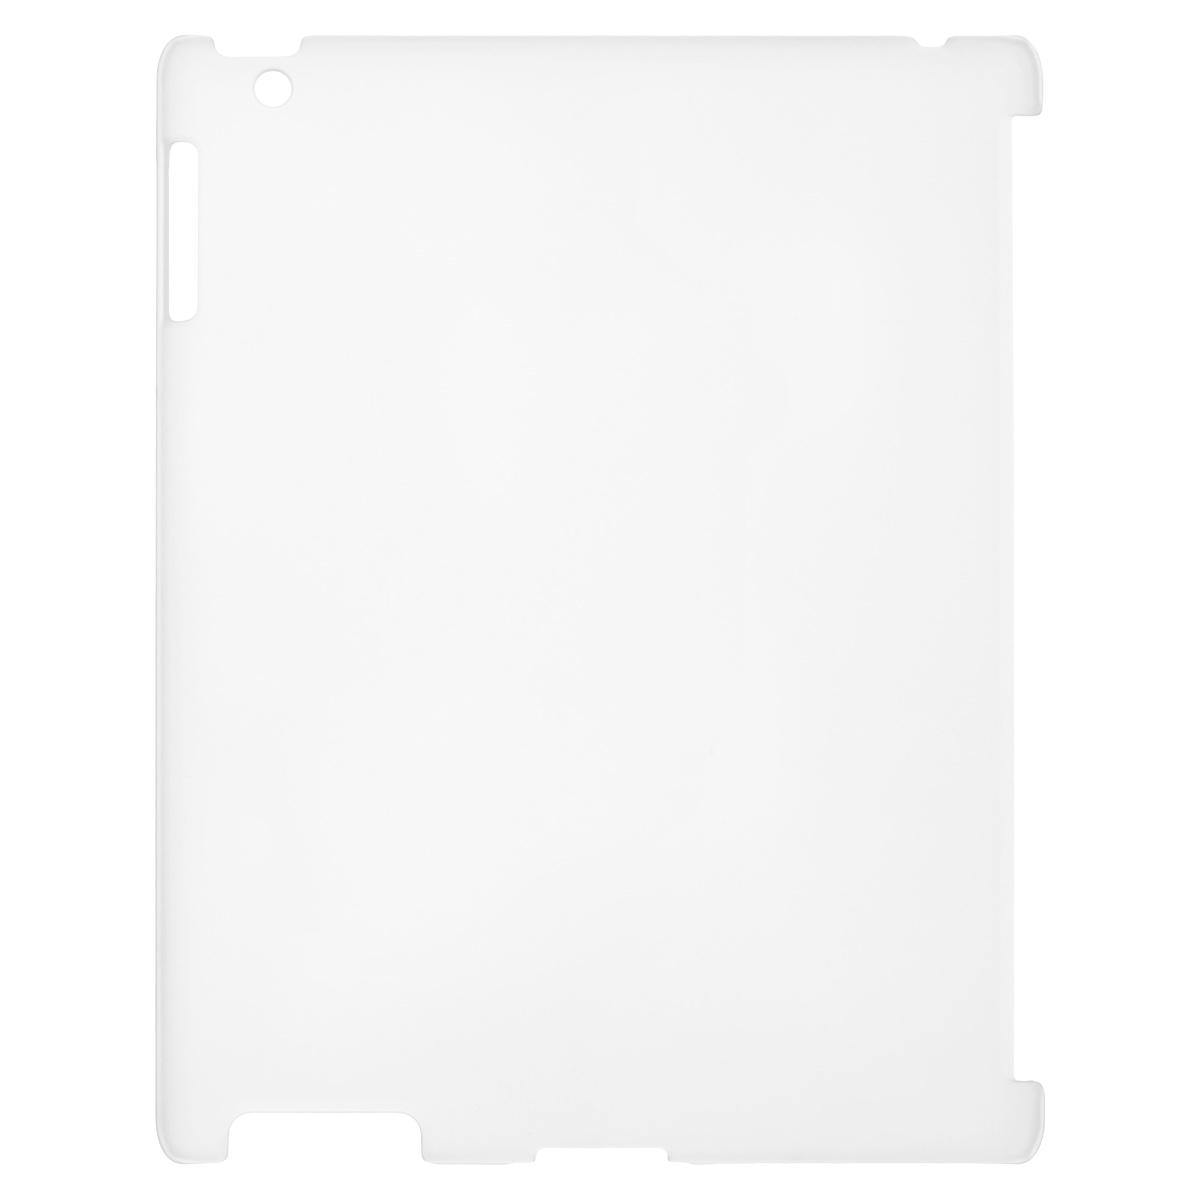 Black Horns чехол для iPad2, White (BH-iD2201)